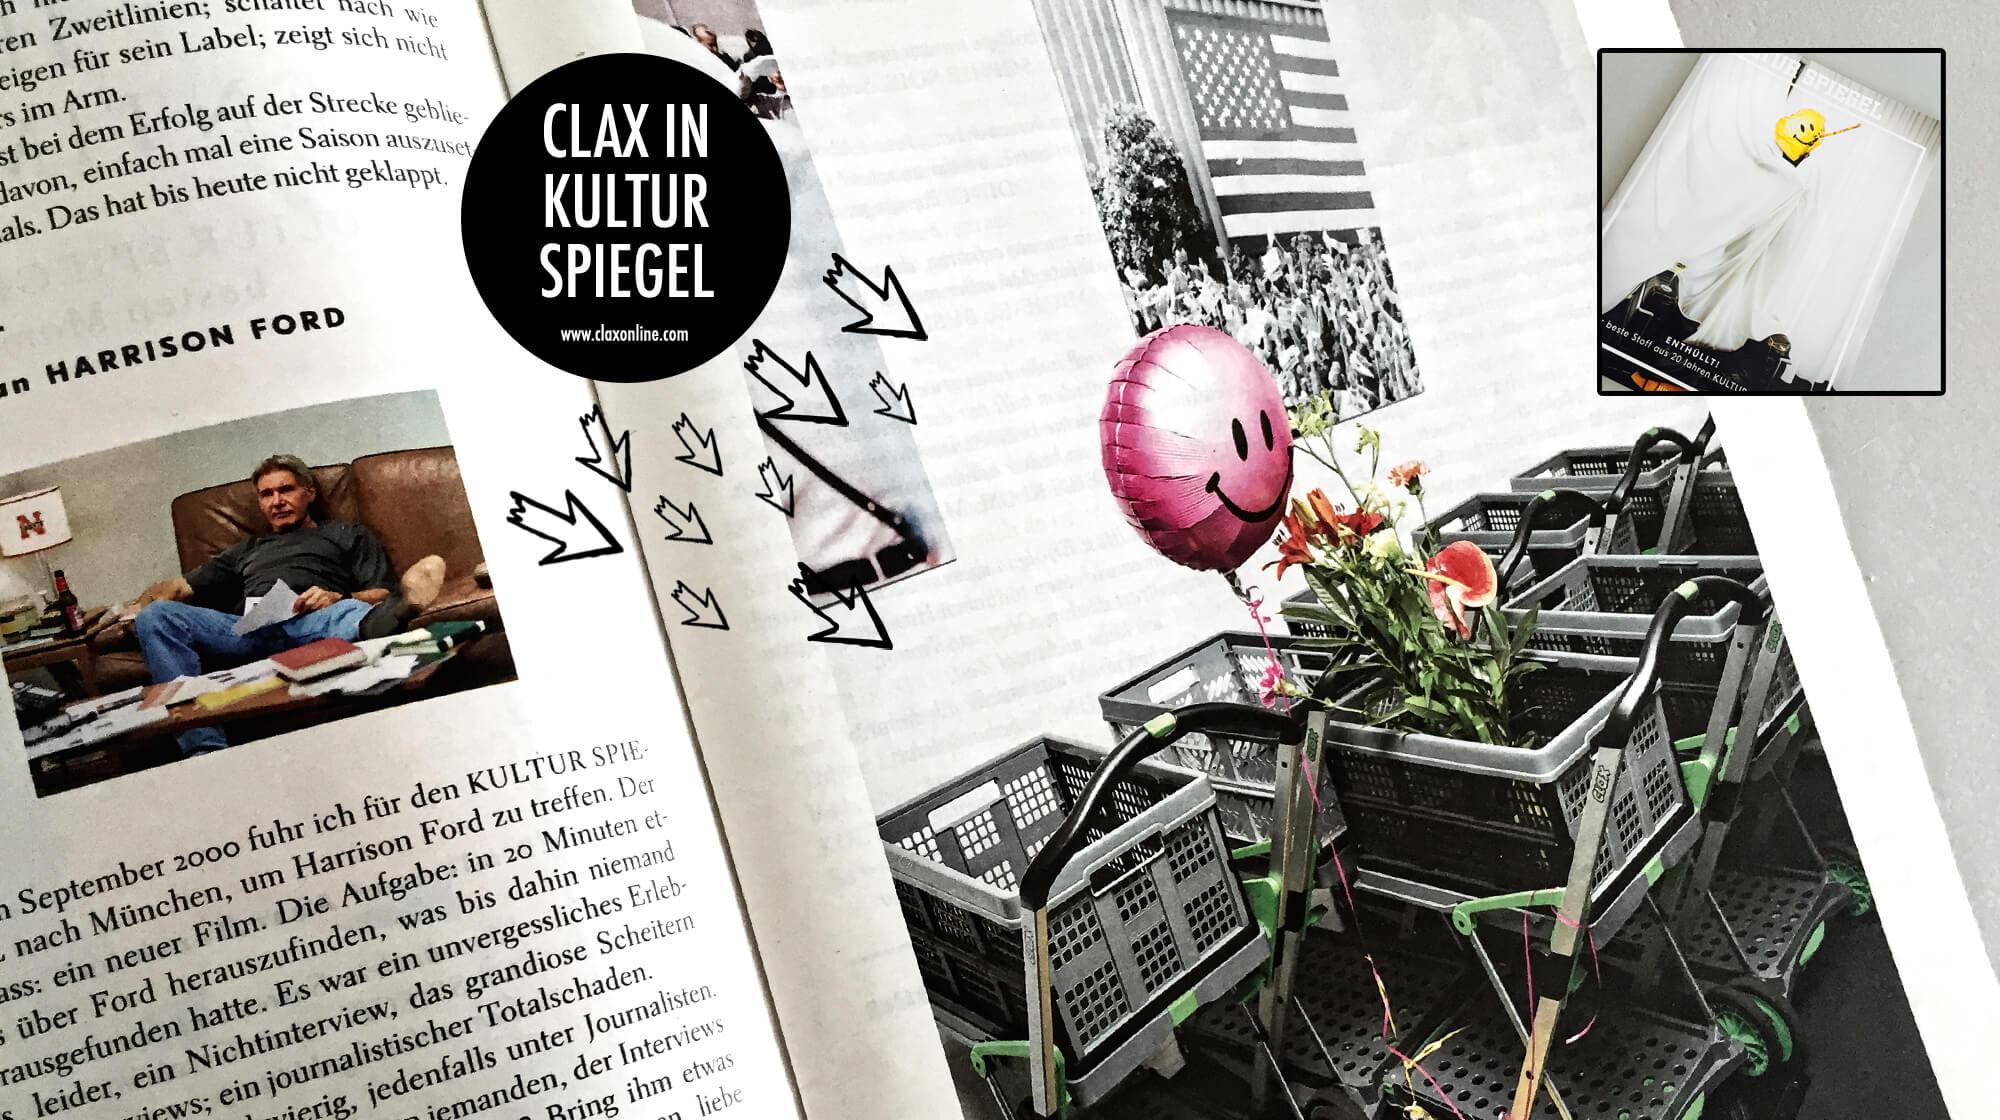 2_clax_in_kultur_spiegel